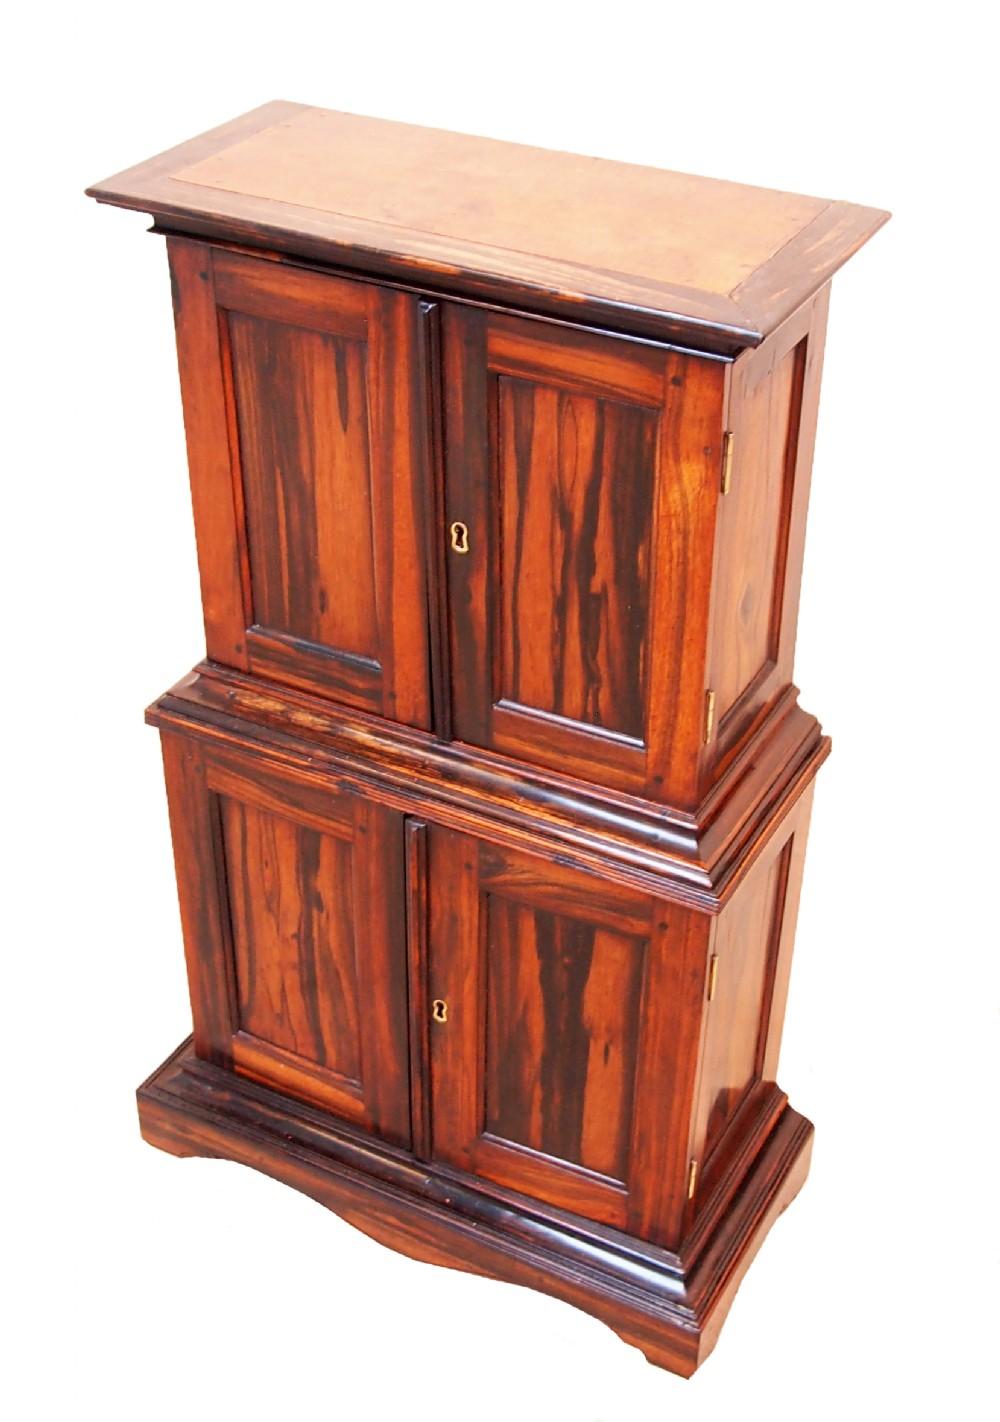 antique regency anglo indian childs coromandel cupboard